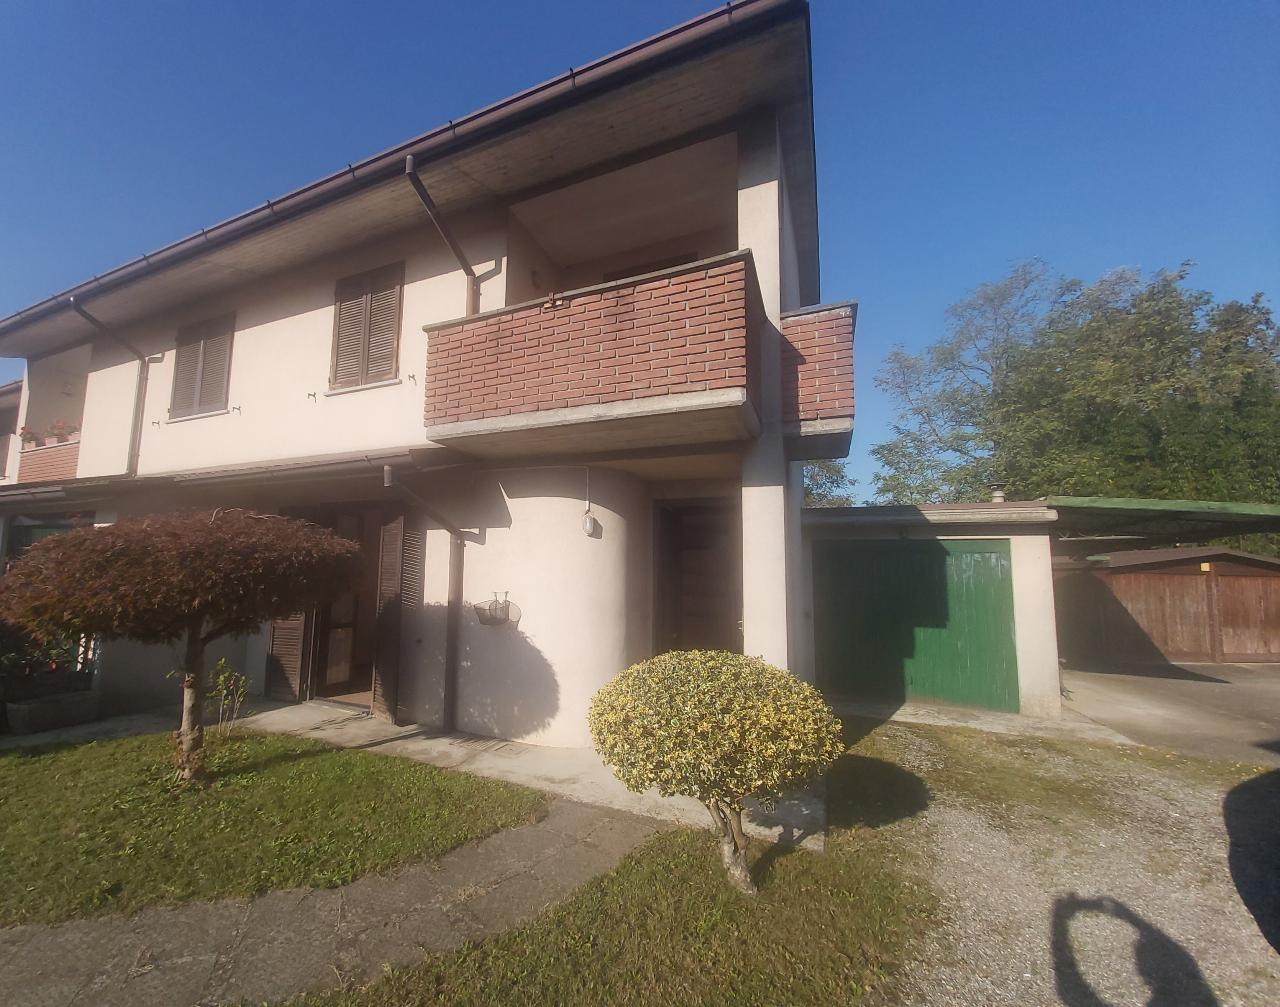 Villa a schiera CASALMORANO €165.000,00